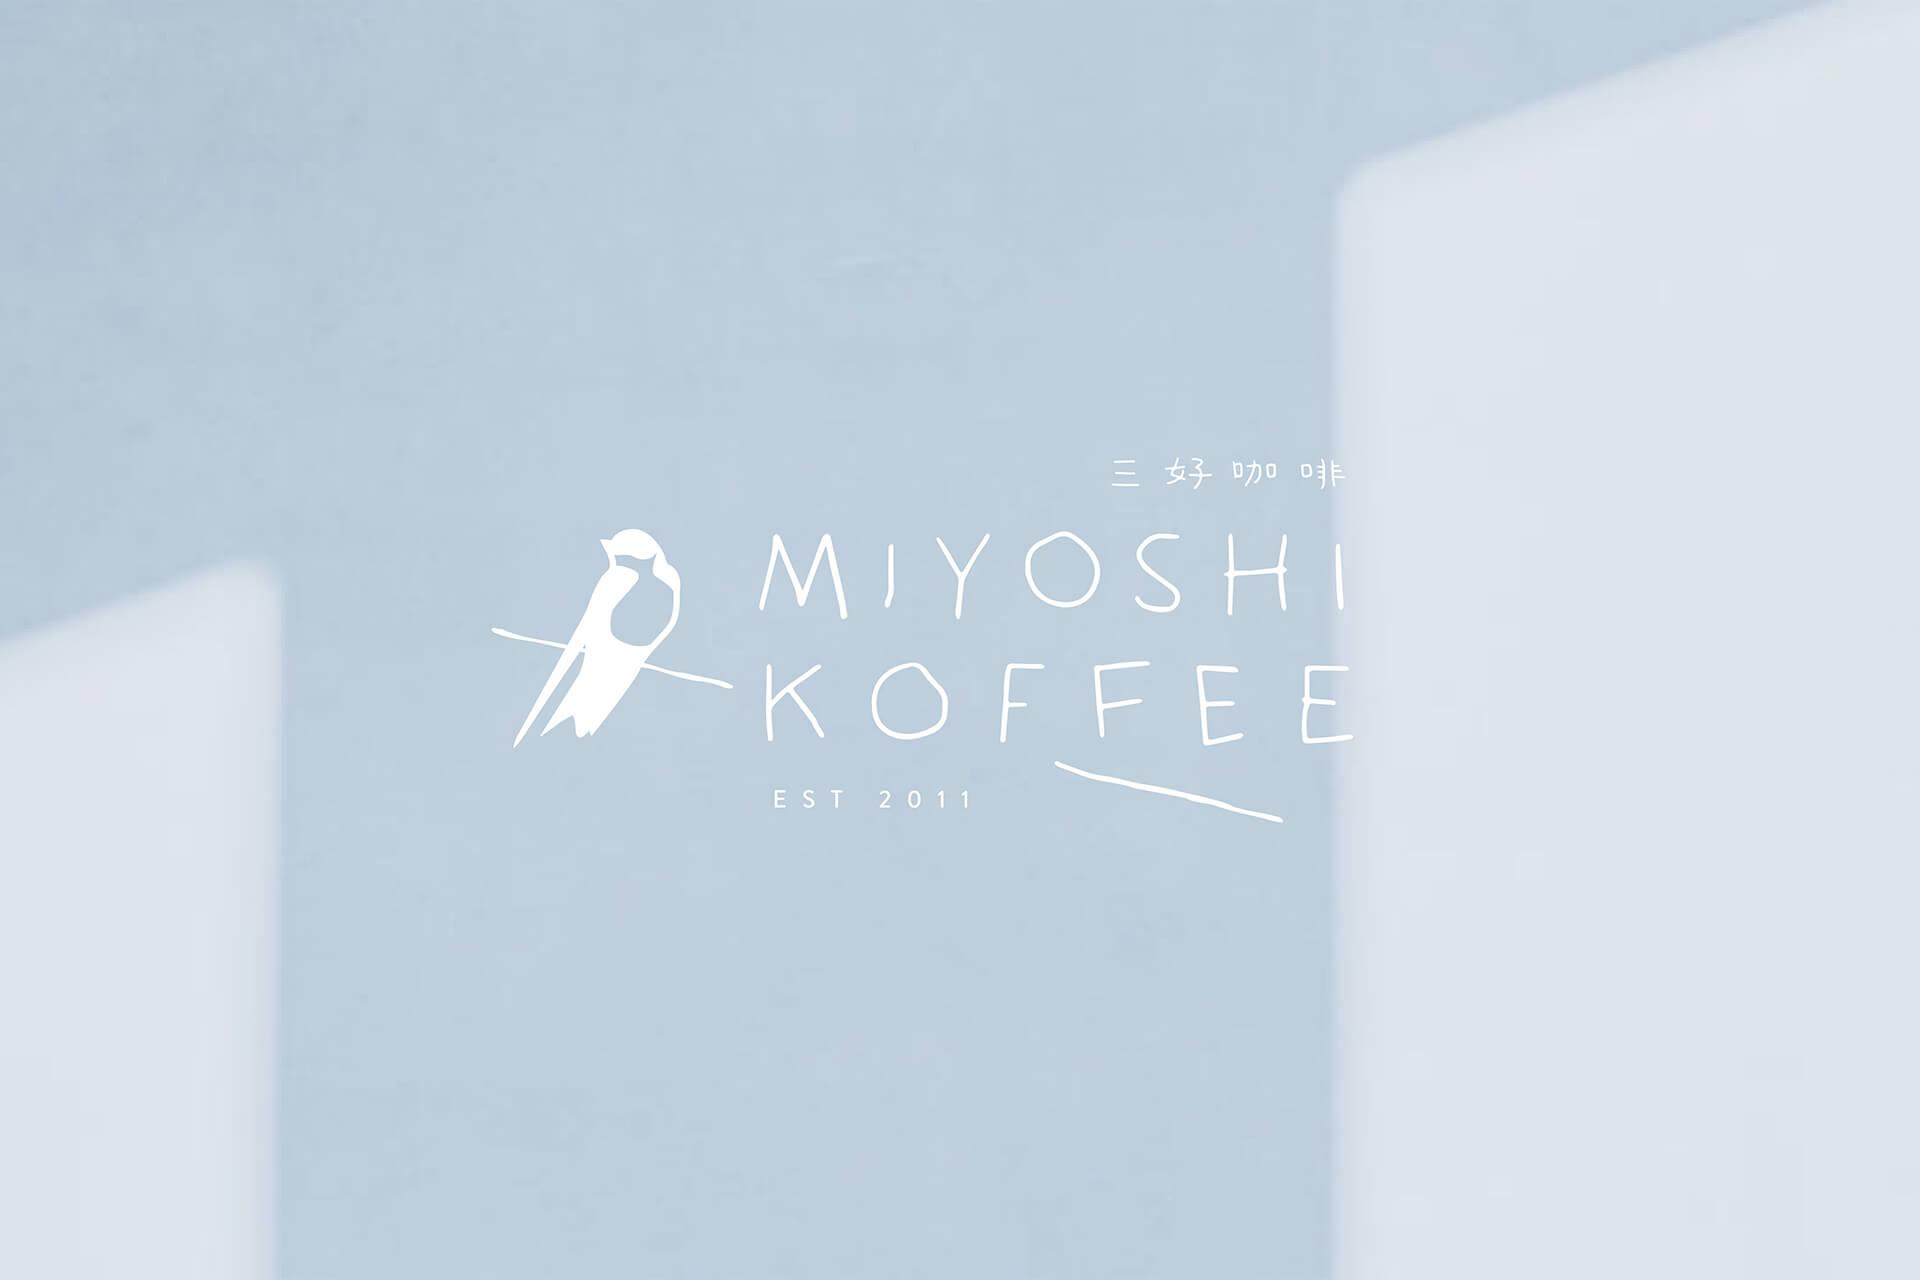 Miyoshi Koffee Branding Design